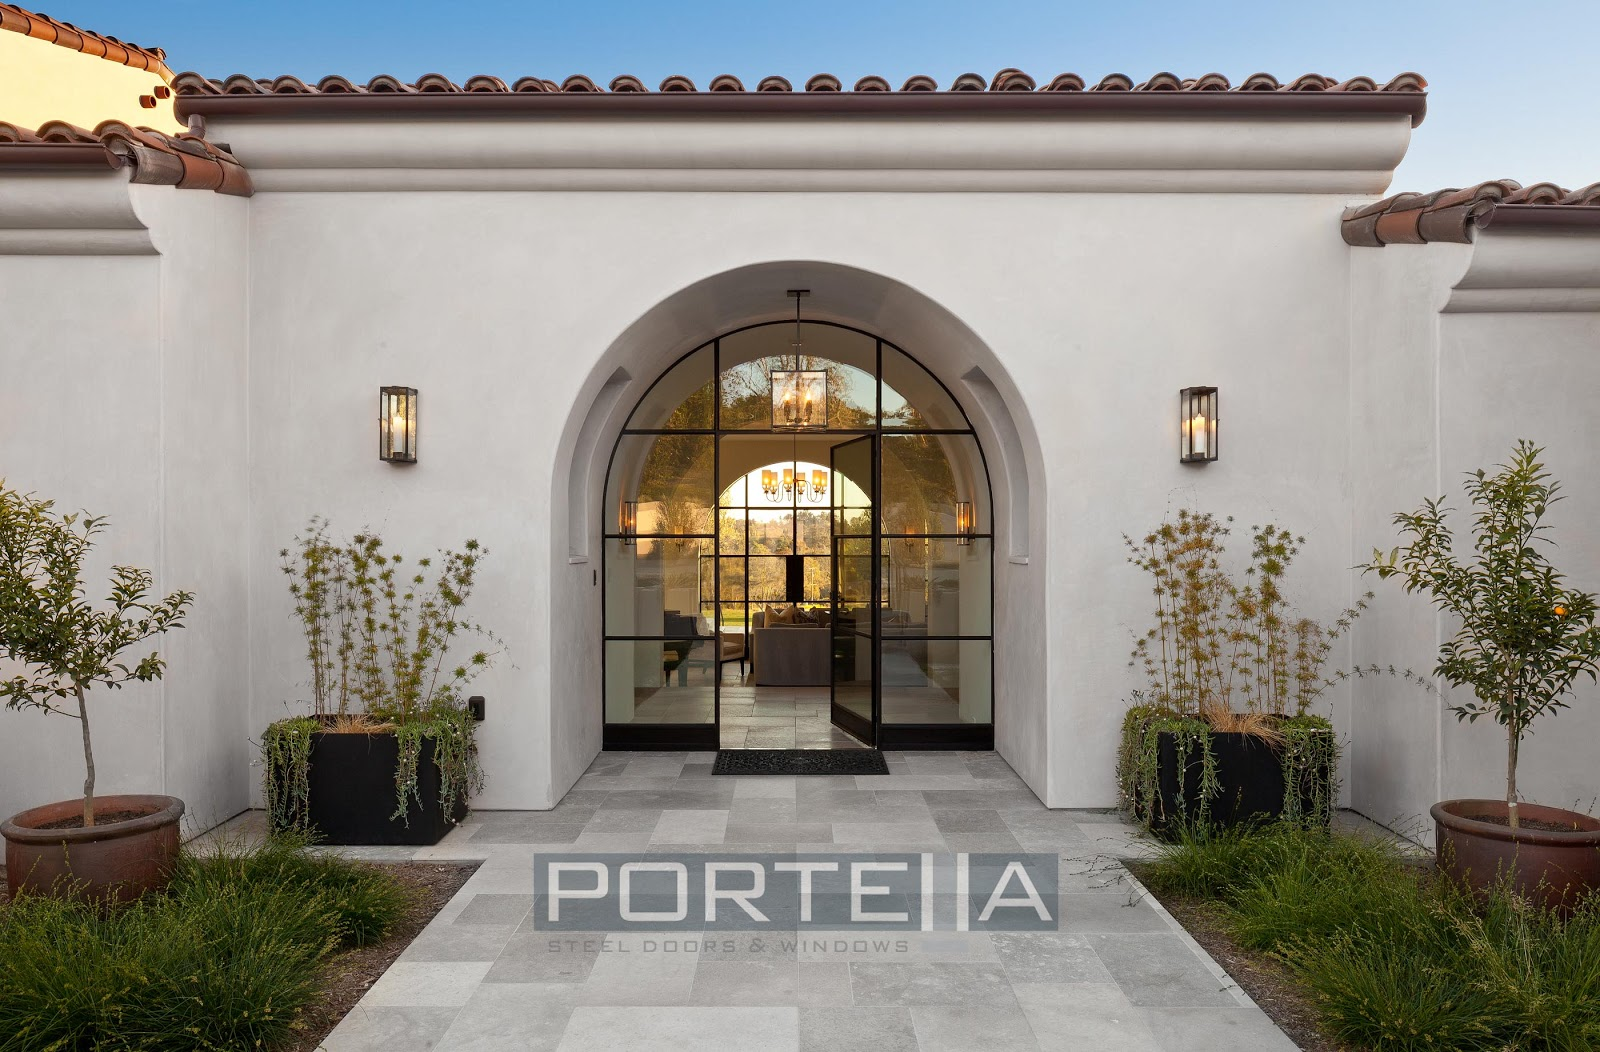 Portella custom steel doors and windows for Custom windows for homes